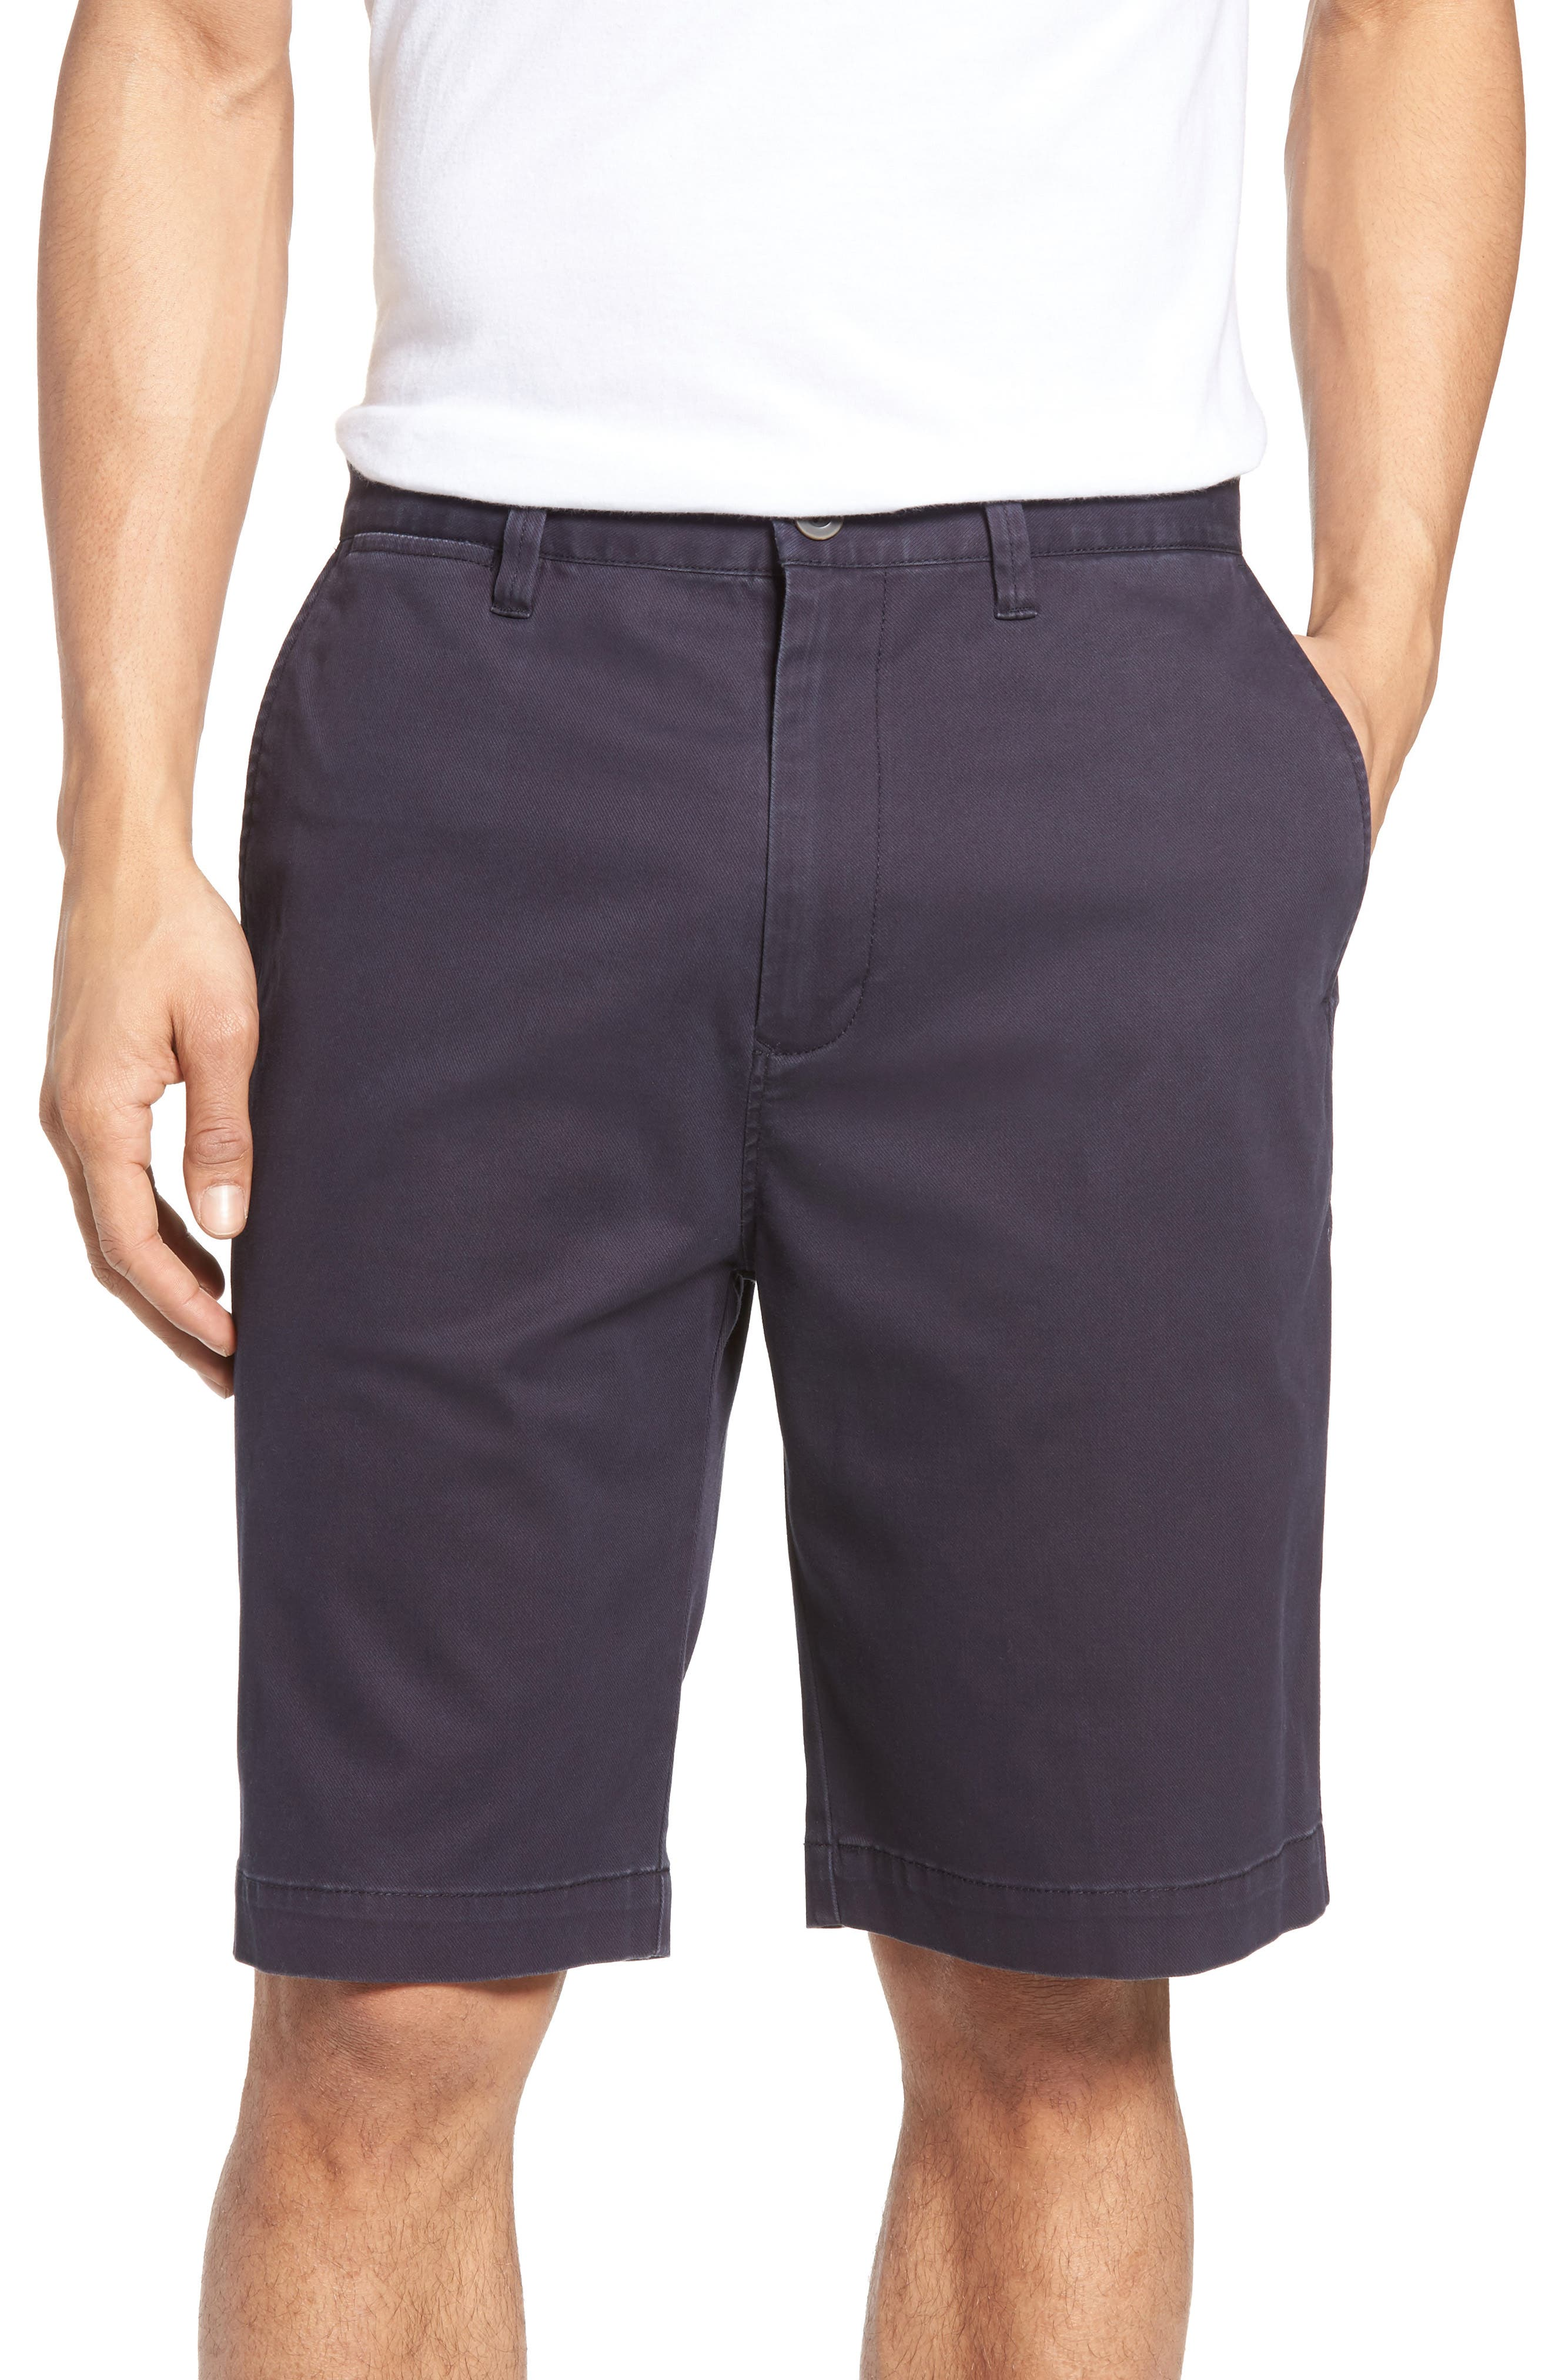 Alternate Image 1 Selected - Rodd & Gunn Peel Forest Chino Shorts